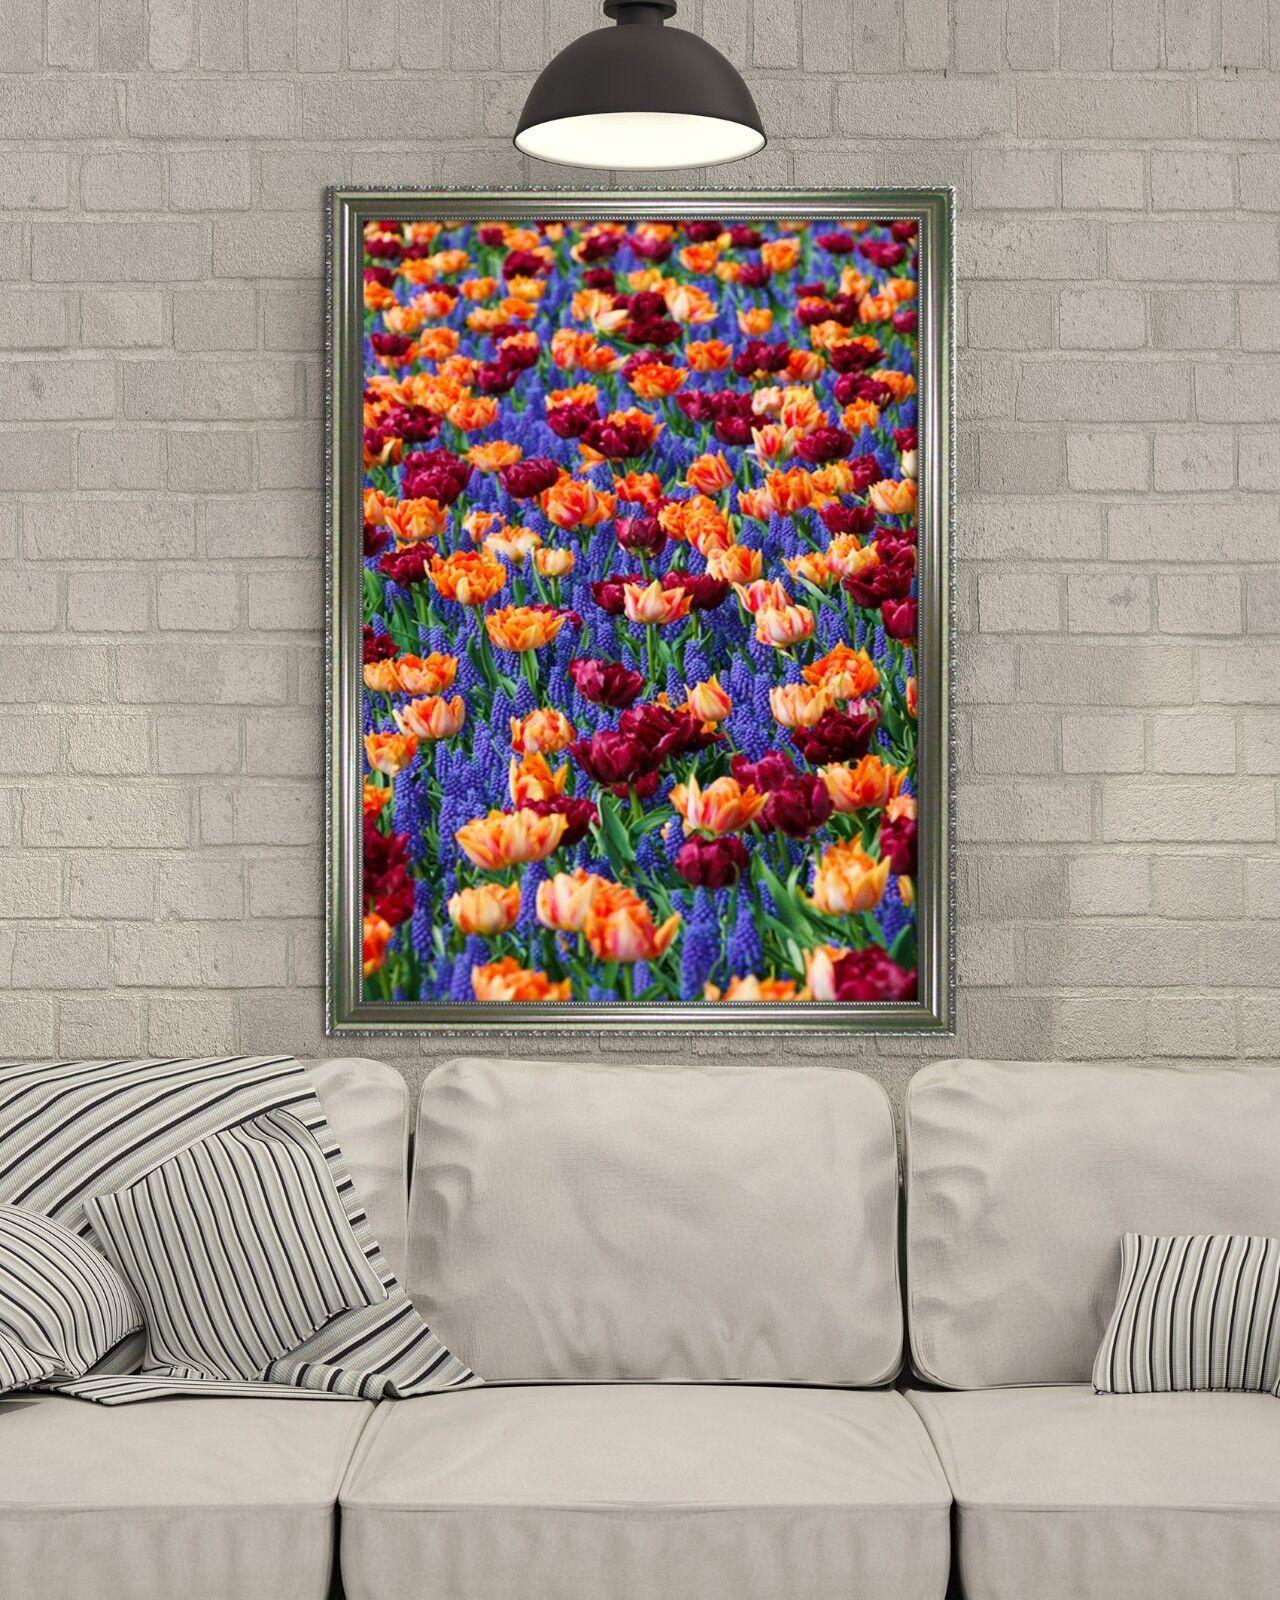 3D Painted Flowers 65 Fake Framed Poster Home Decor Drucken Painting Unique Kunst